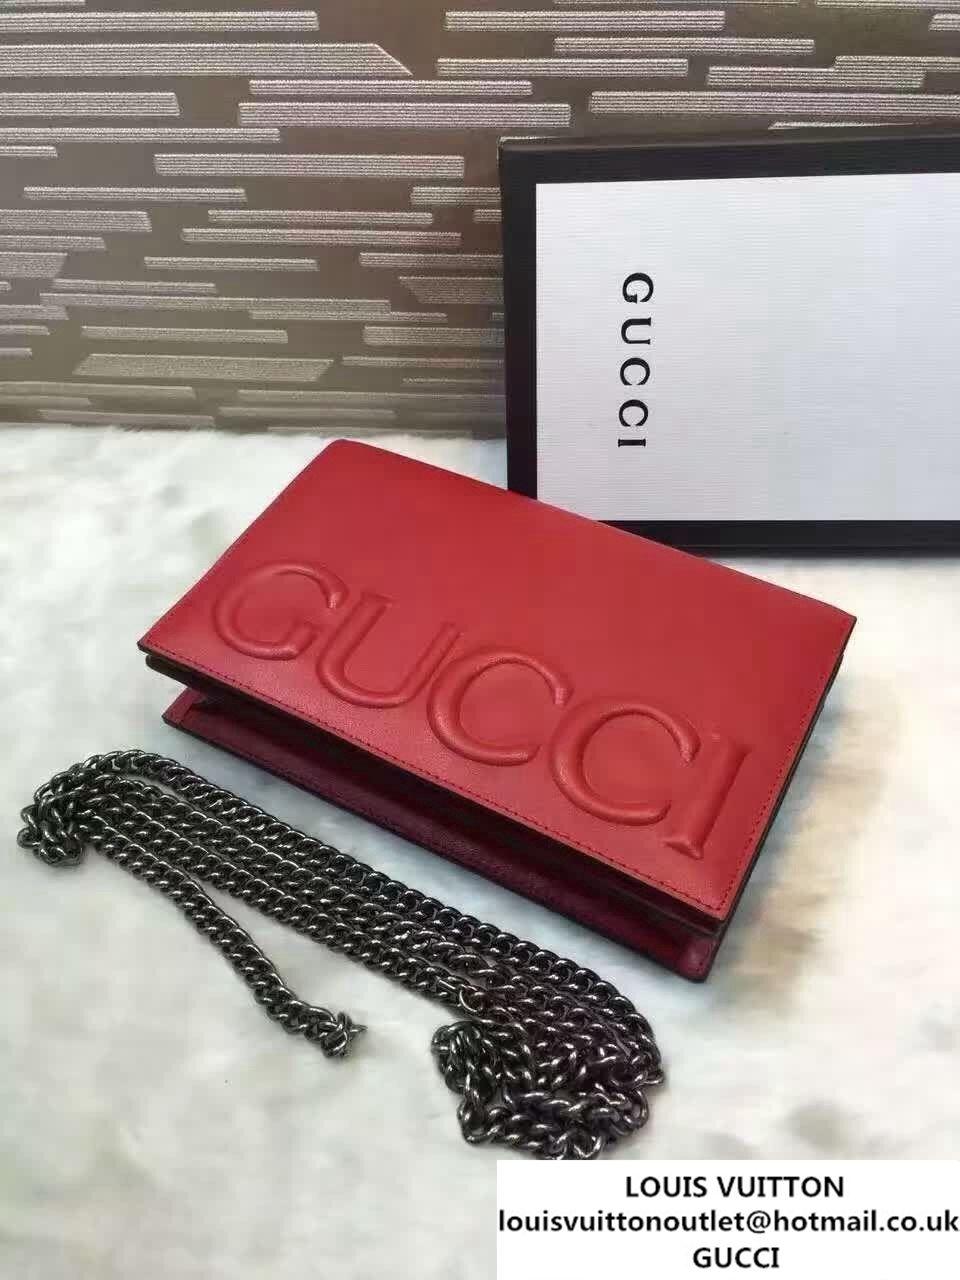 dd1ca166abf Gucci XL Leather Mini Chain Shoulder Bag 421850 Red 2016